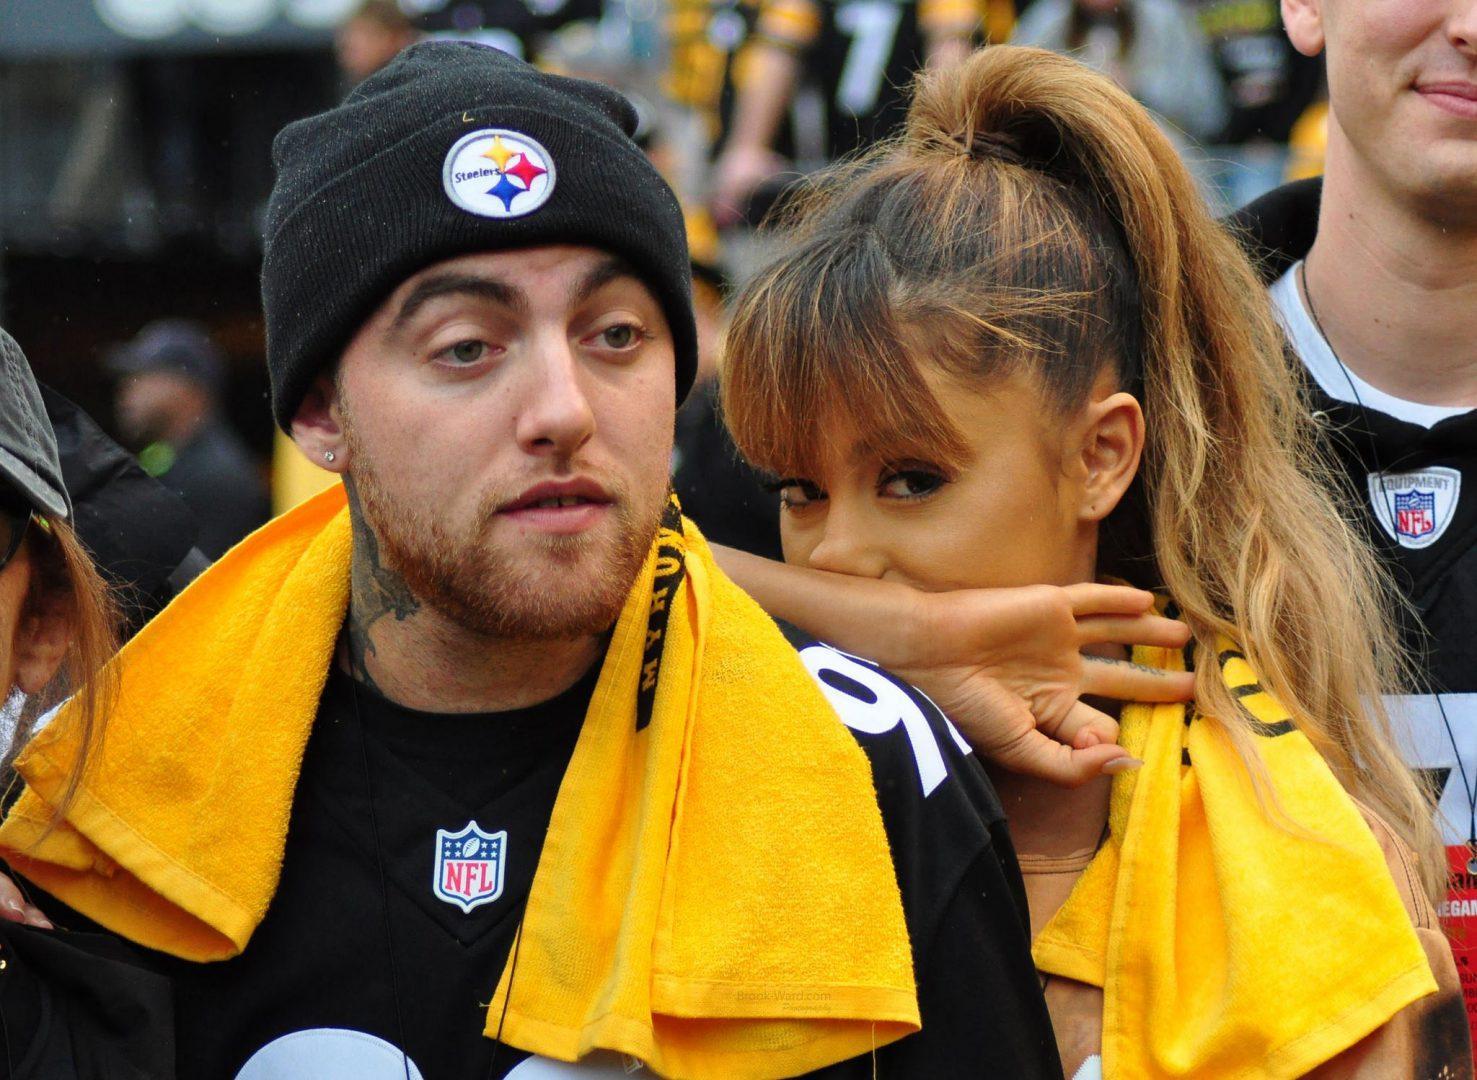 Mac Miller's Death Is Not Ariana Grande's Fault